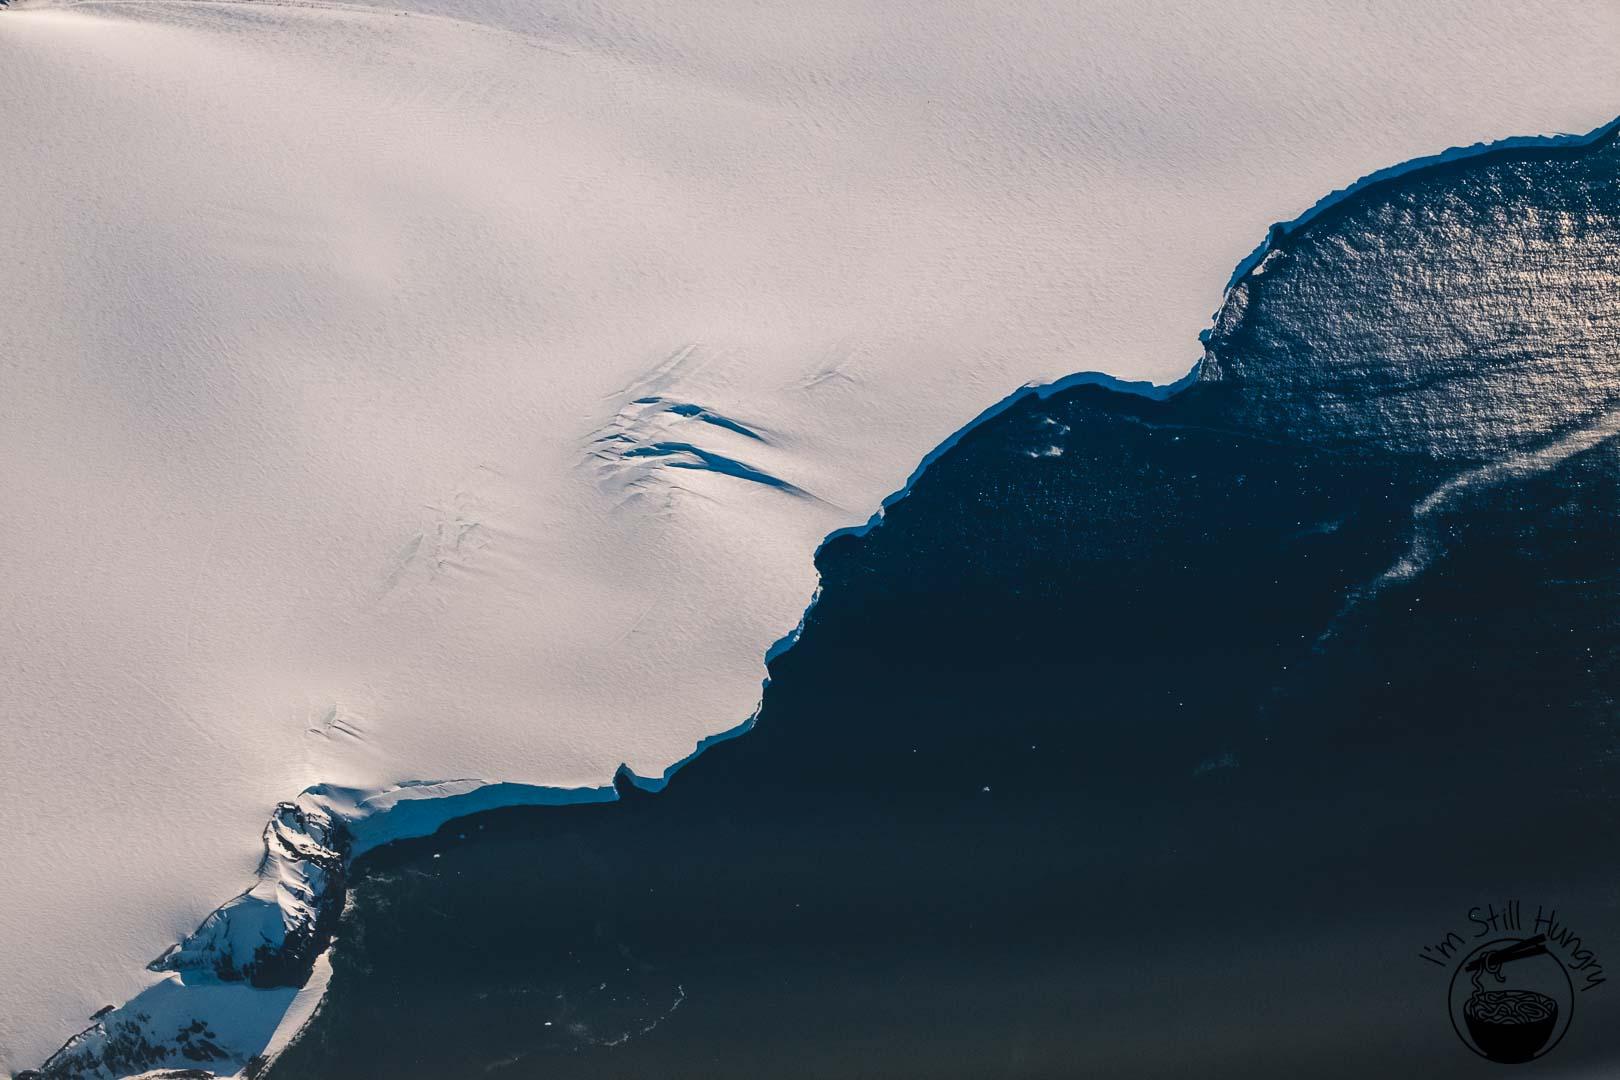 A Sightseeing Flight Over Antarctica